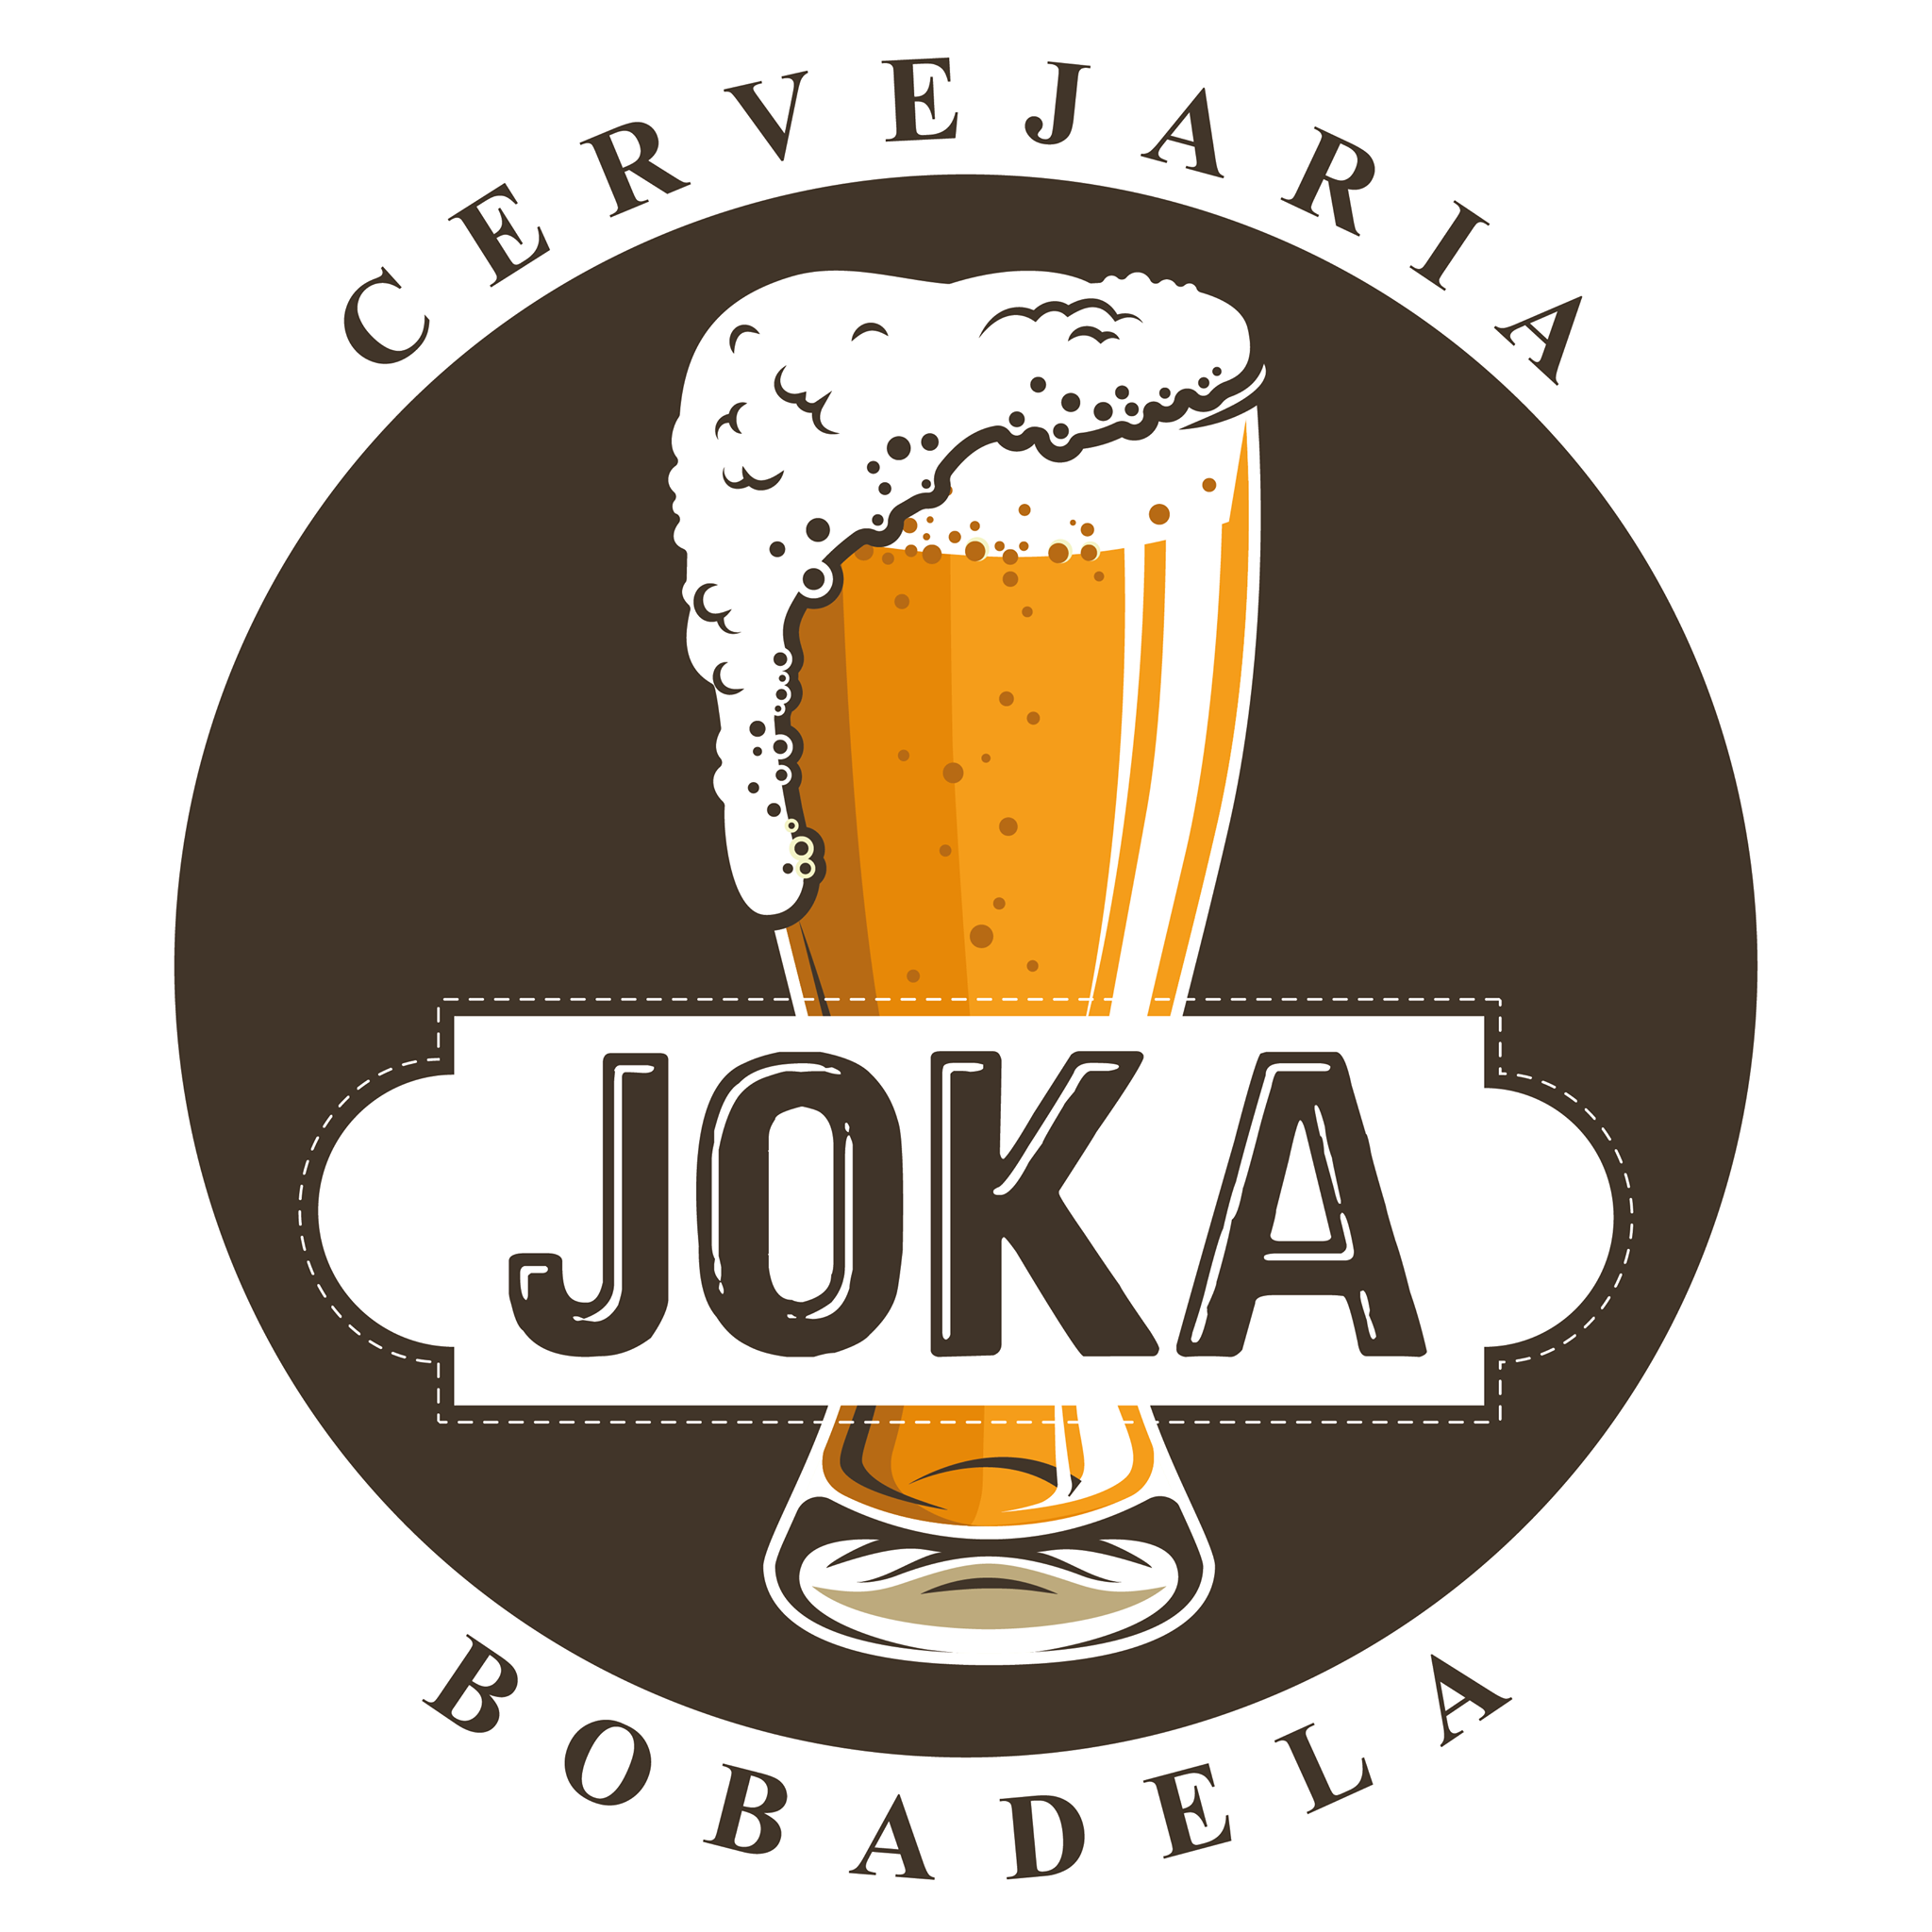 Cervejaria Joka